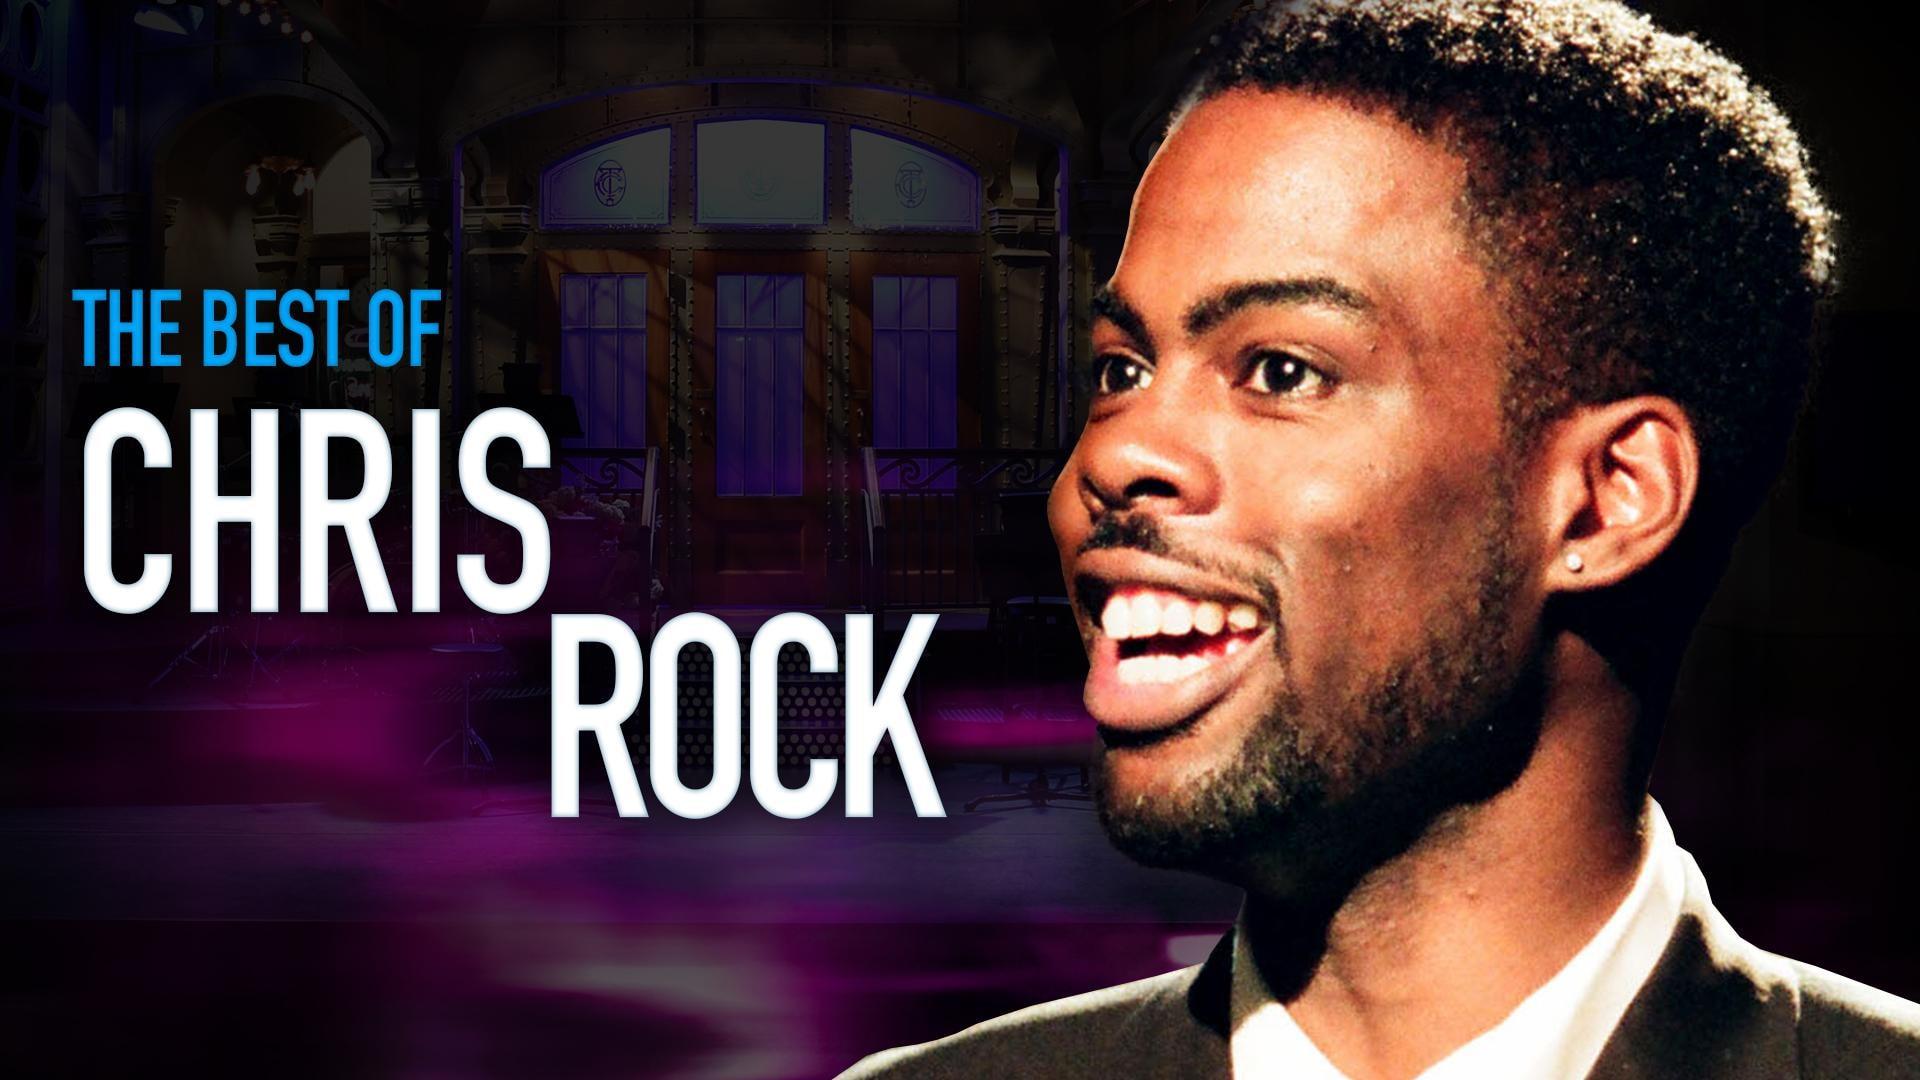 The Best of Chris Rock